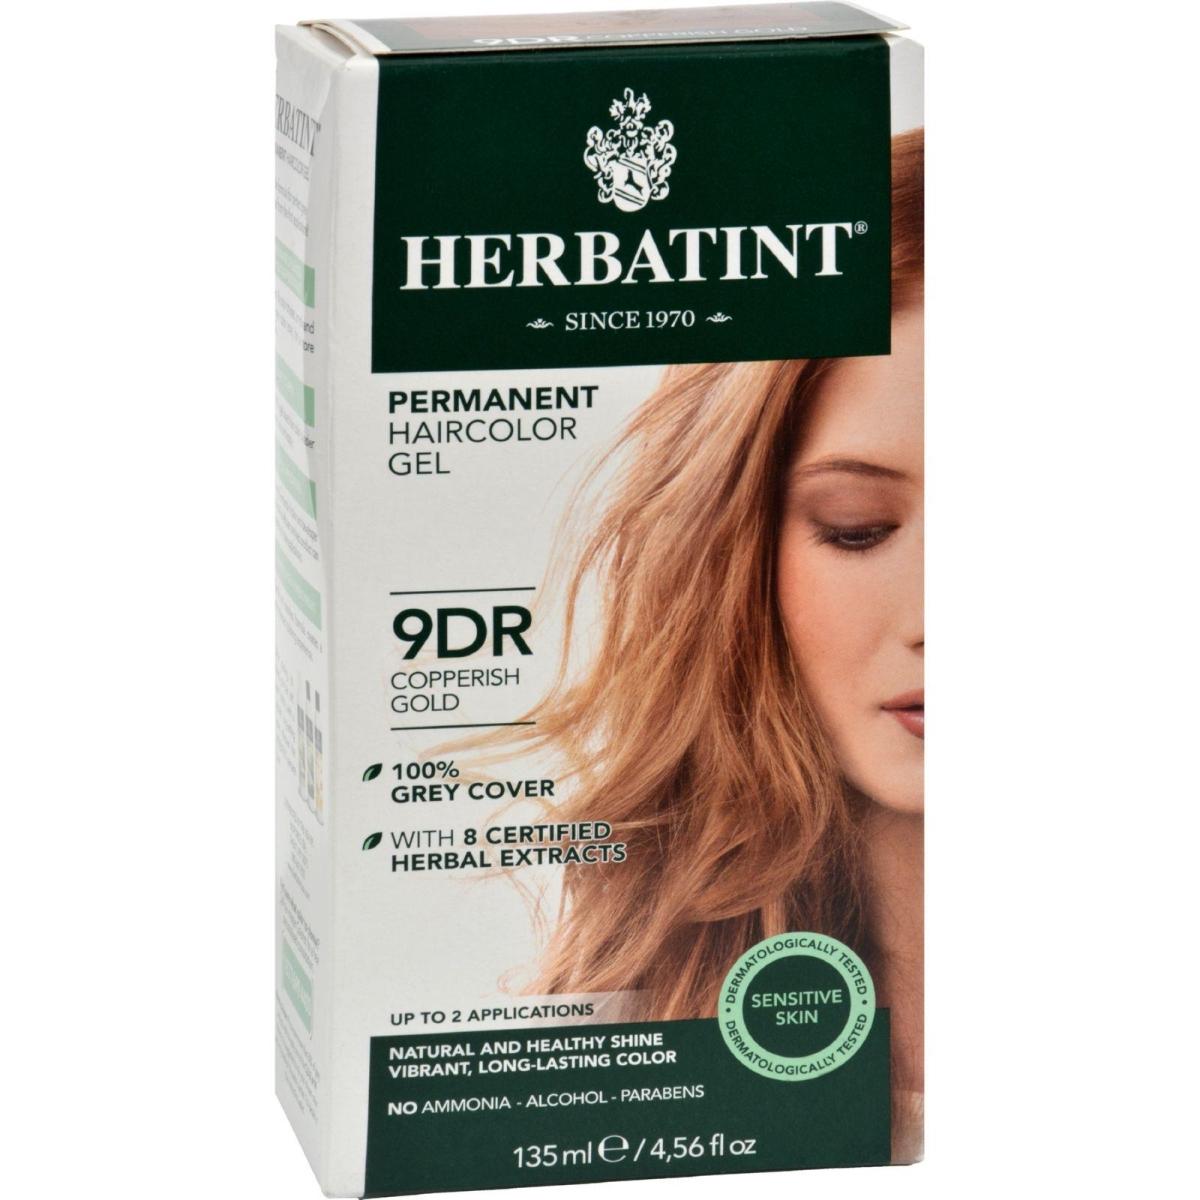 Herbatint HG0227033 Haircolor Kit Copperish Gold 9D